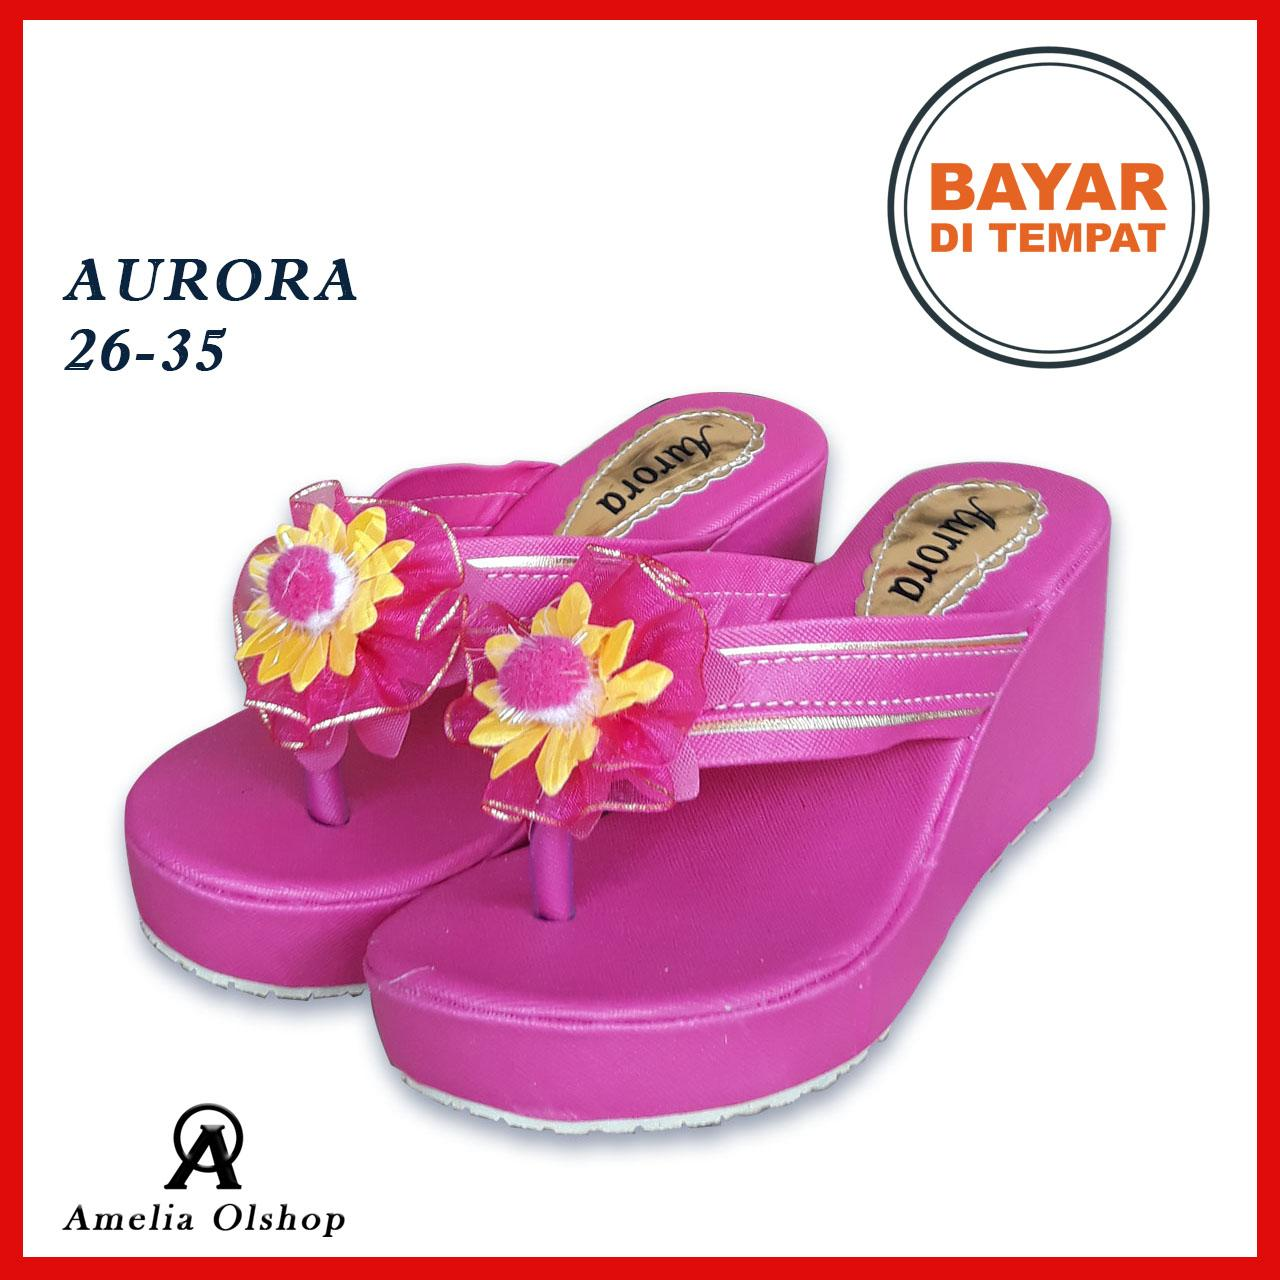 Buy Sell Cheapest Sandal Santai Wedges Best Quality Product Deals Zr01 Tan Amelia Olshop Aurora 26 35 Jinjit Anak Cewek